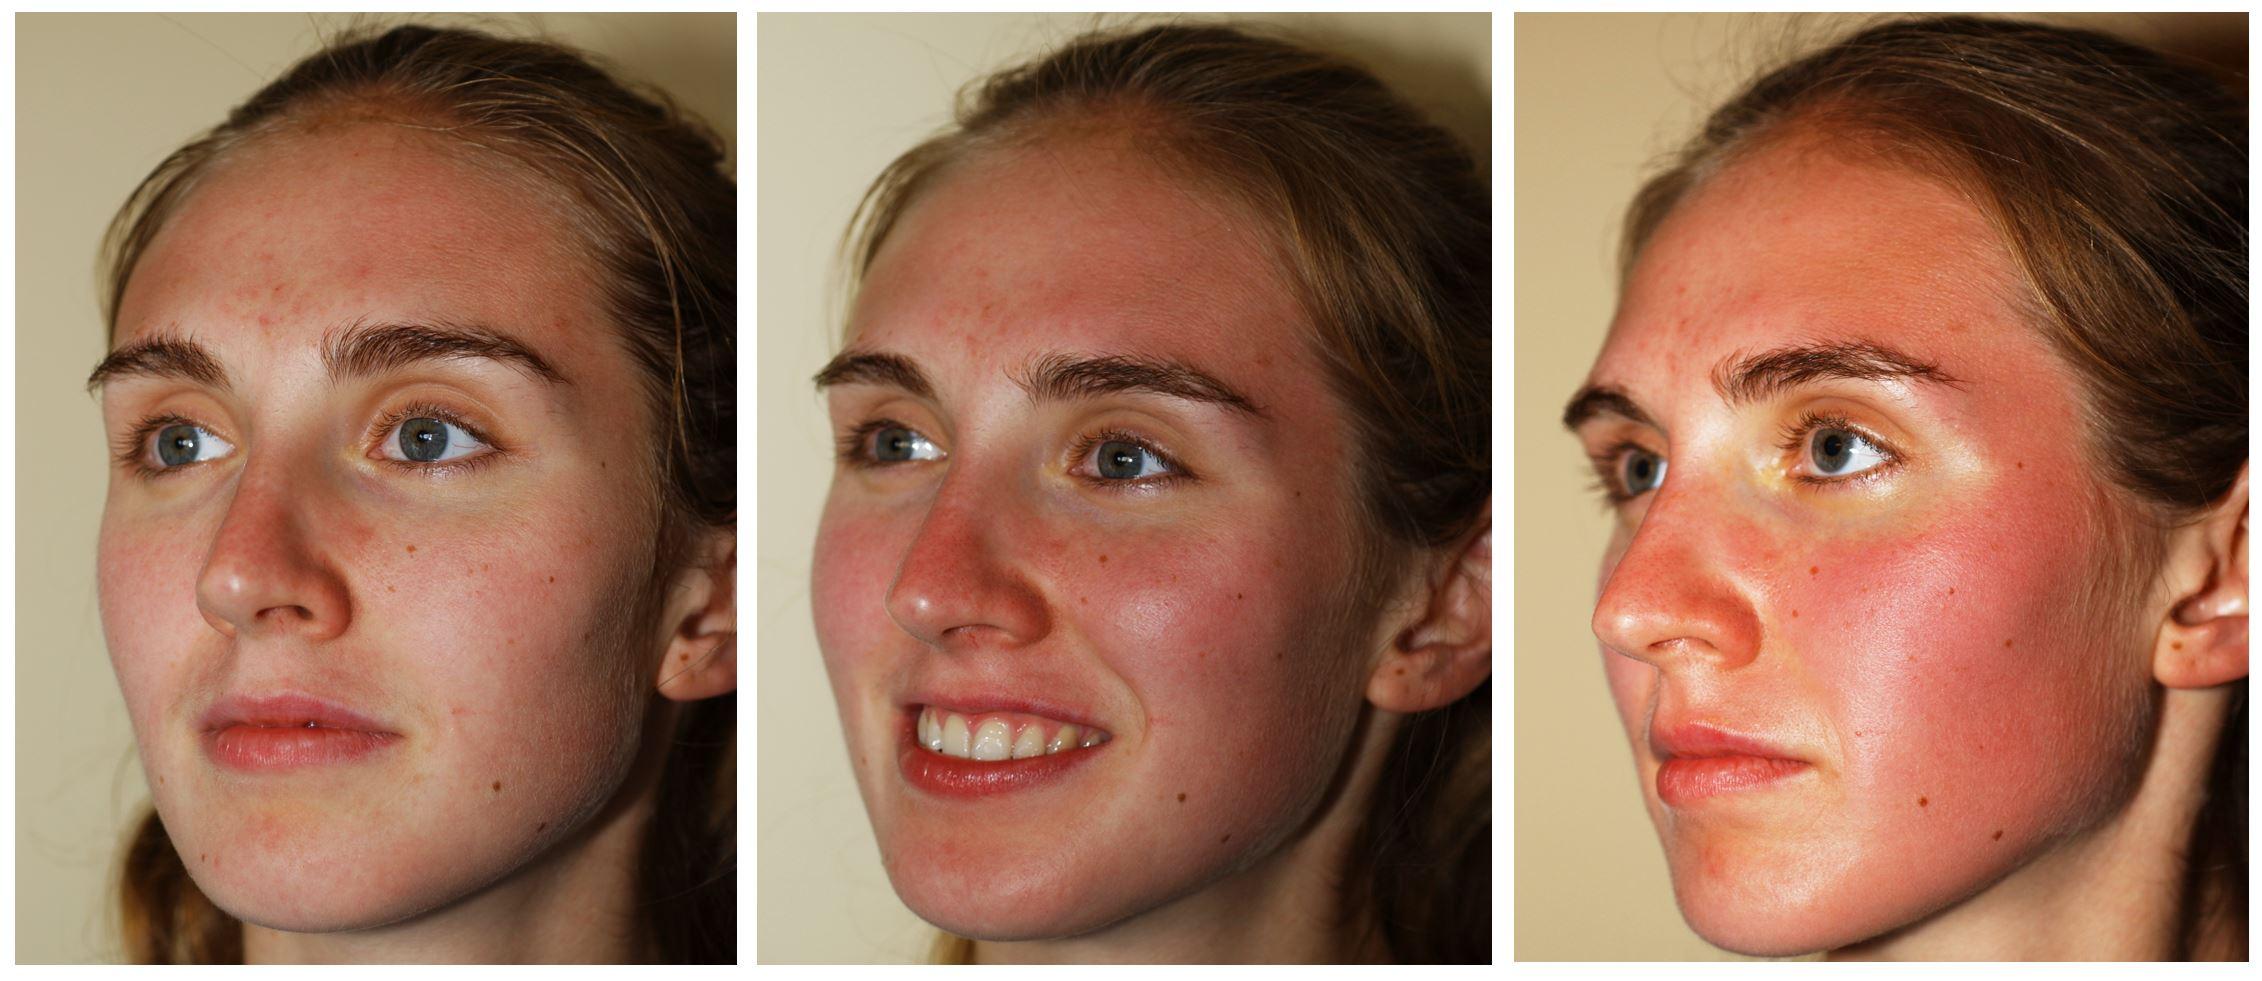 Villani Treatment - 15 minutes after mild, medium, and strong